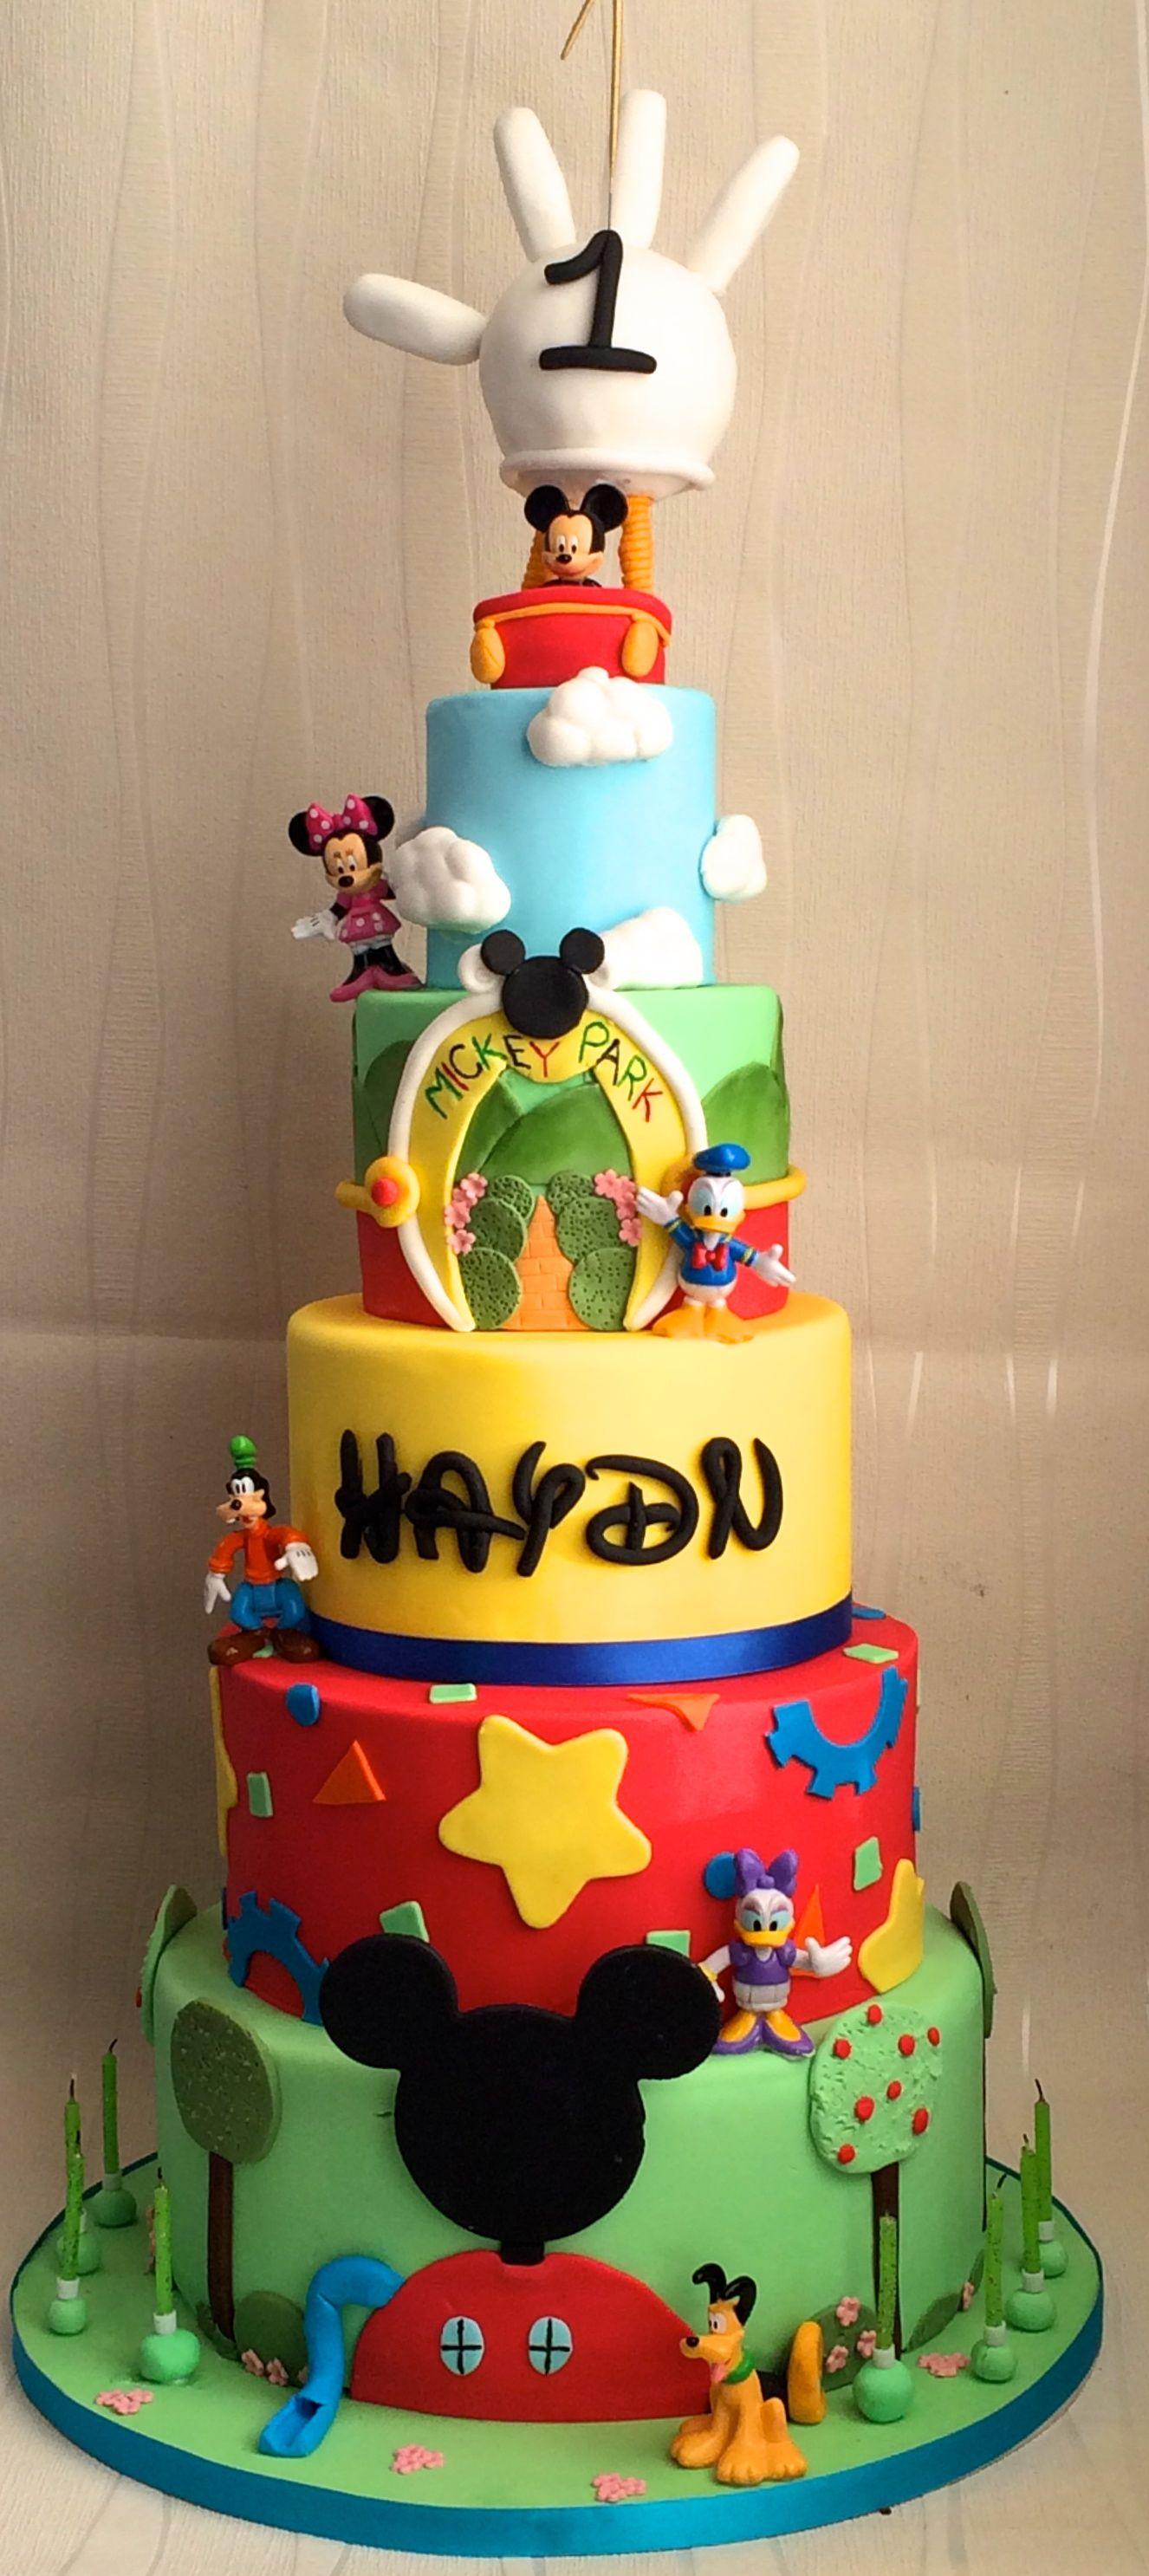 Kids S Cakes Sugar Plum Cake Company Mickey Mouse Clubhouse Birthday Cake Mickey Mouse Birthday Cake Mickey And Minnie Cake